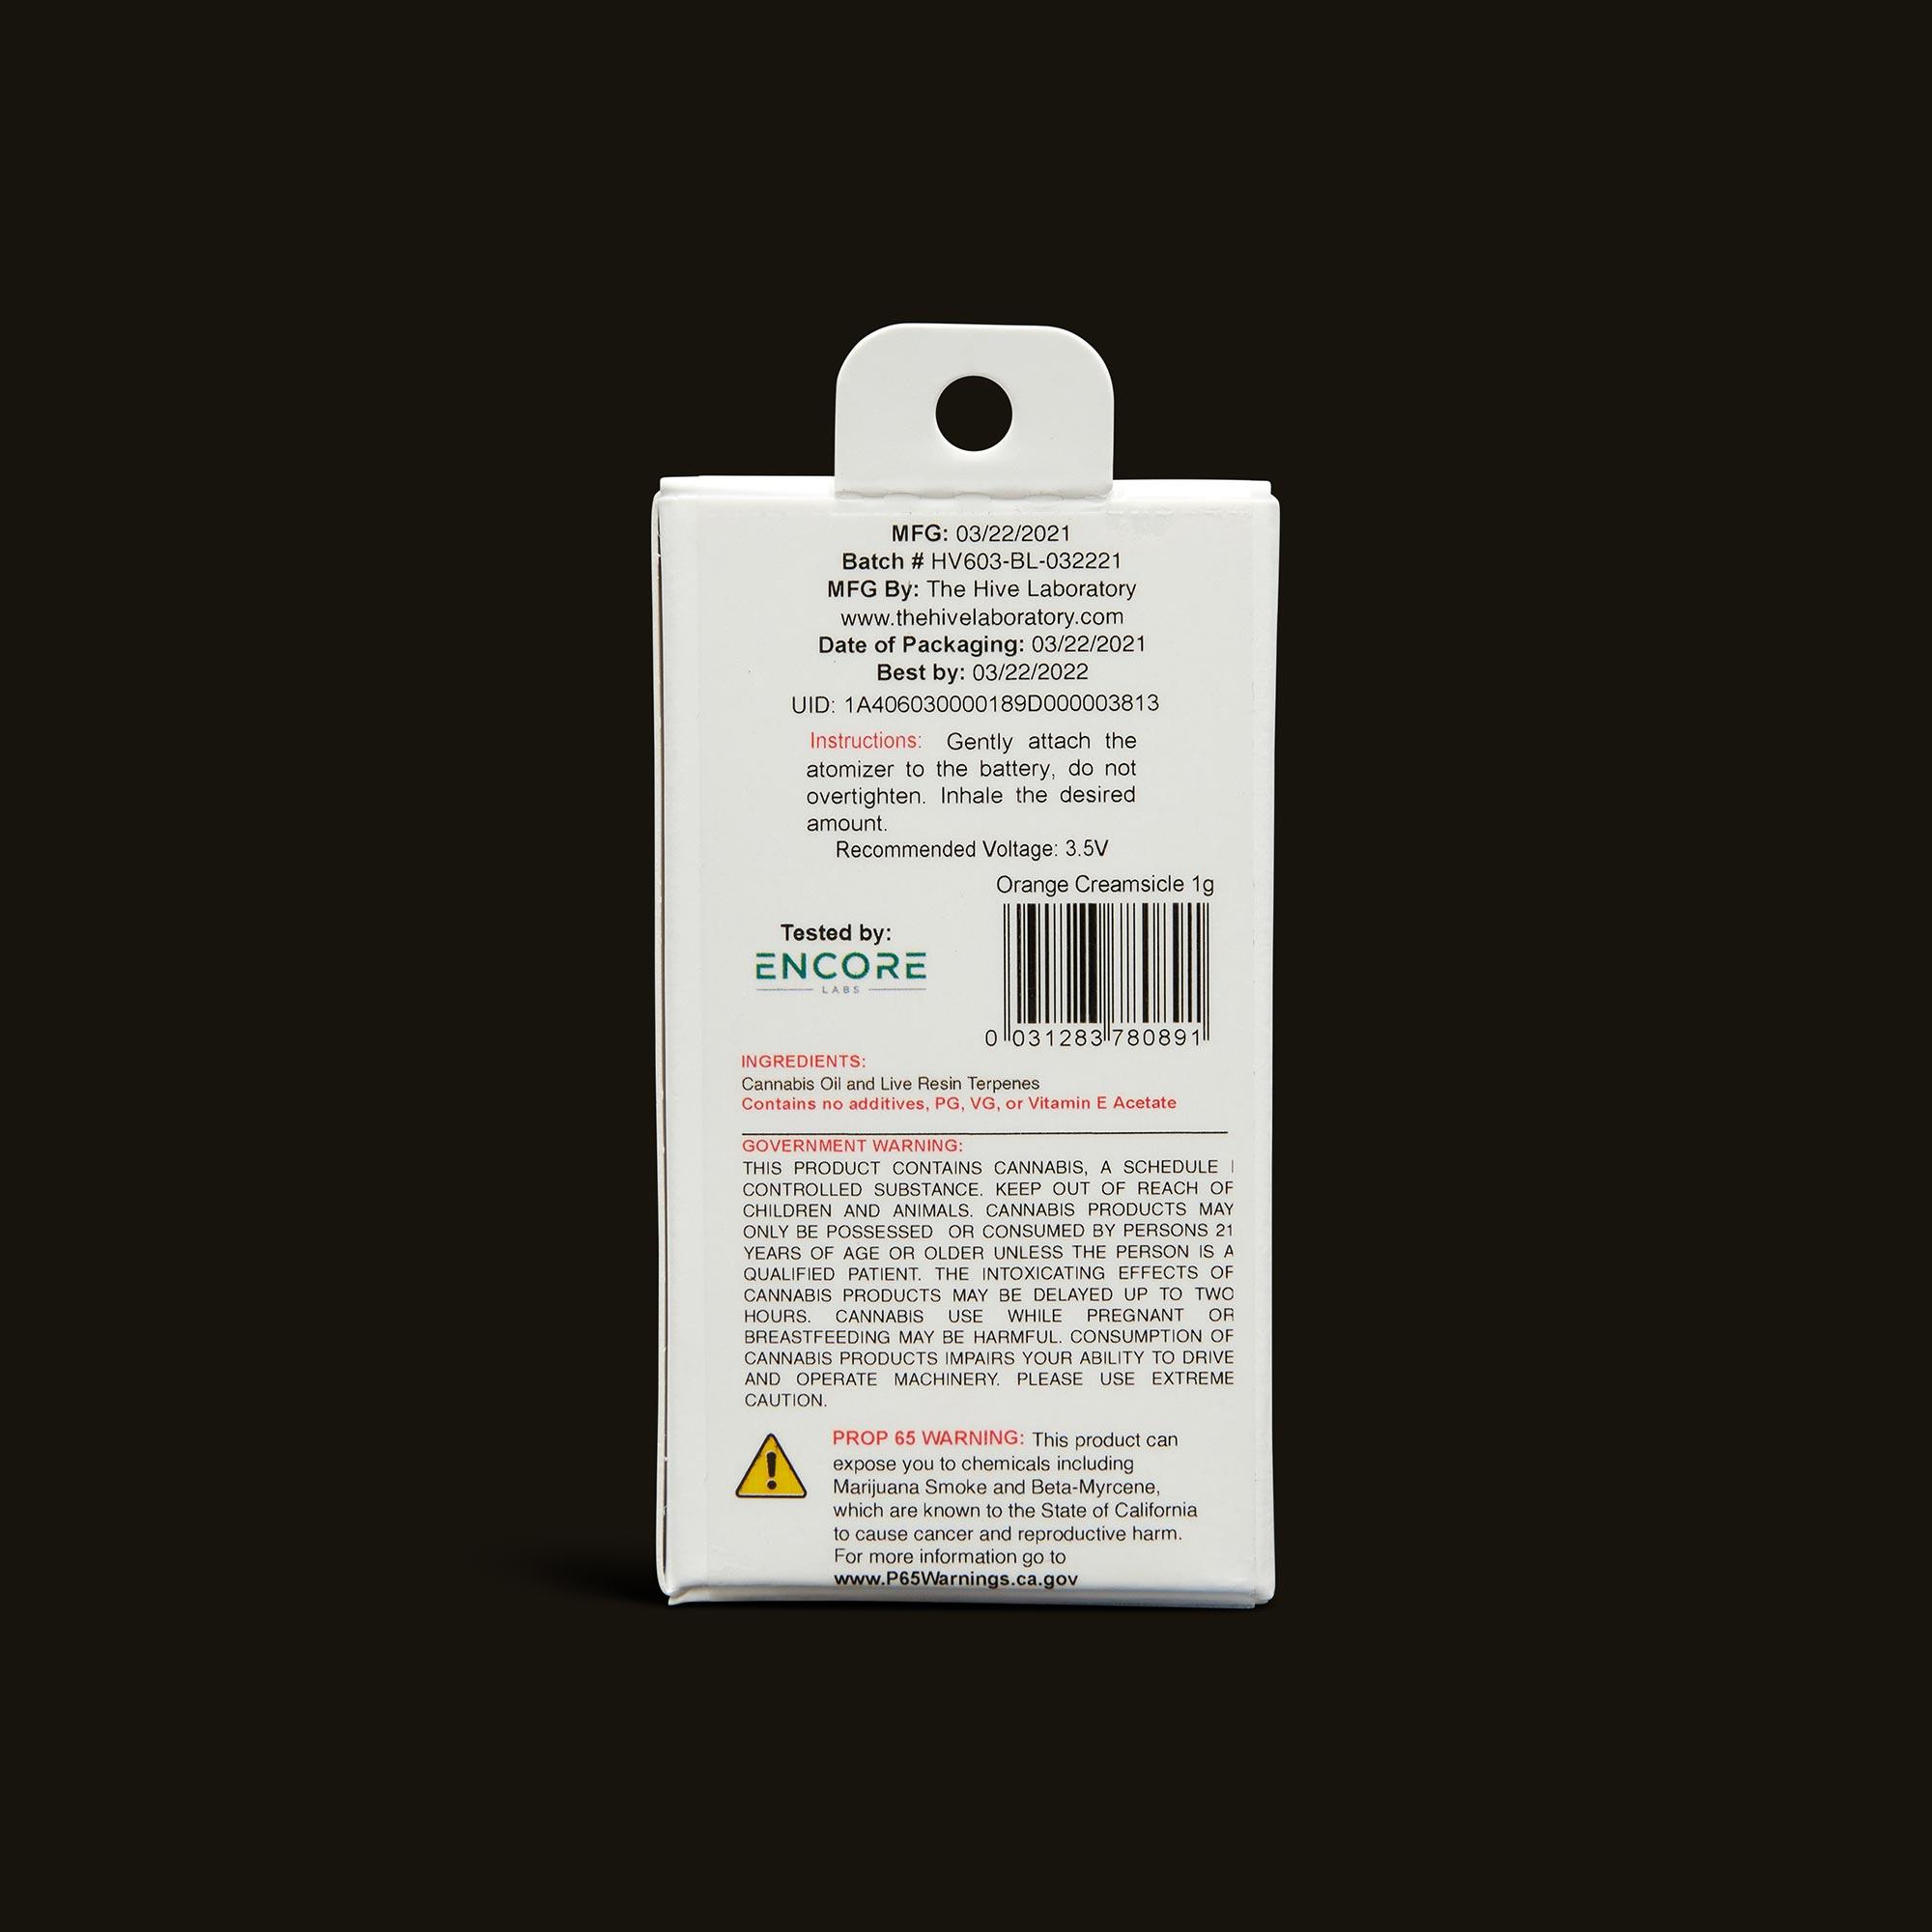 Bloom Brands Vape Pen - Orange Creamsicle Live Resin Cartridge - 1g